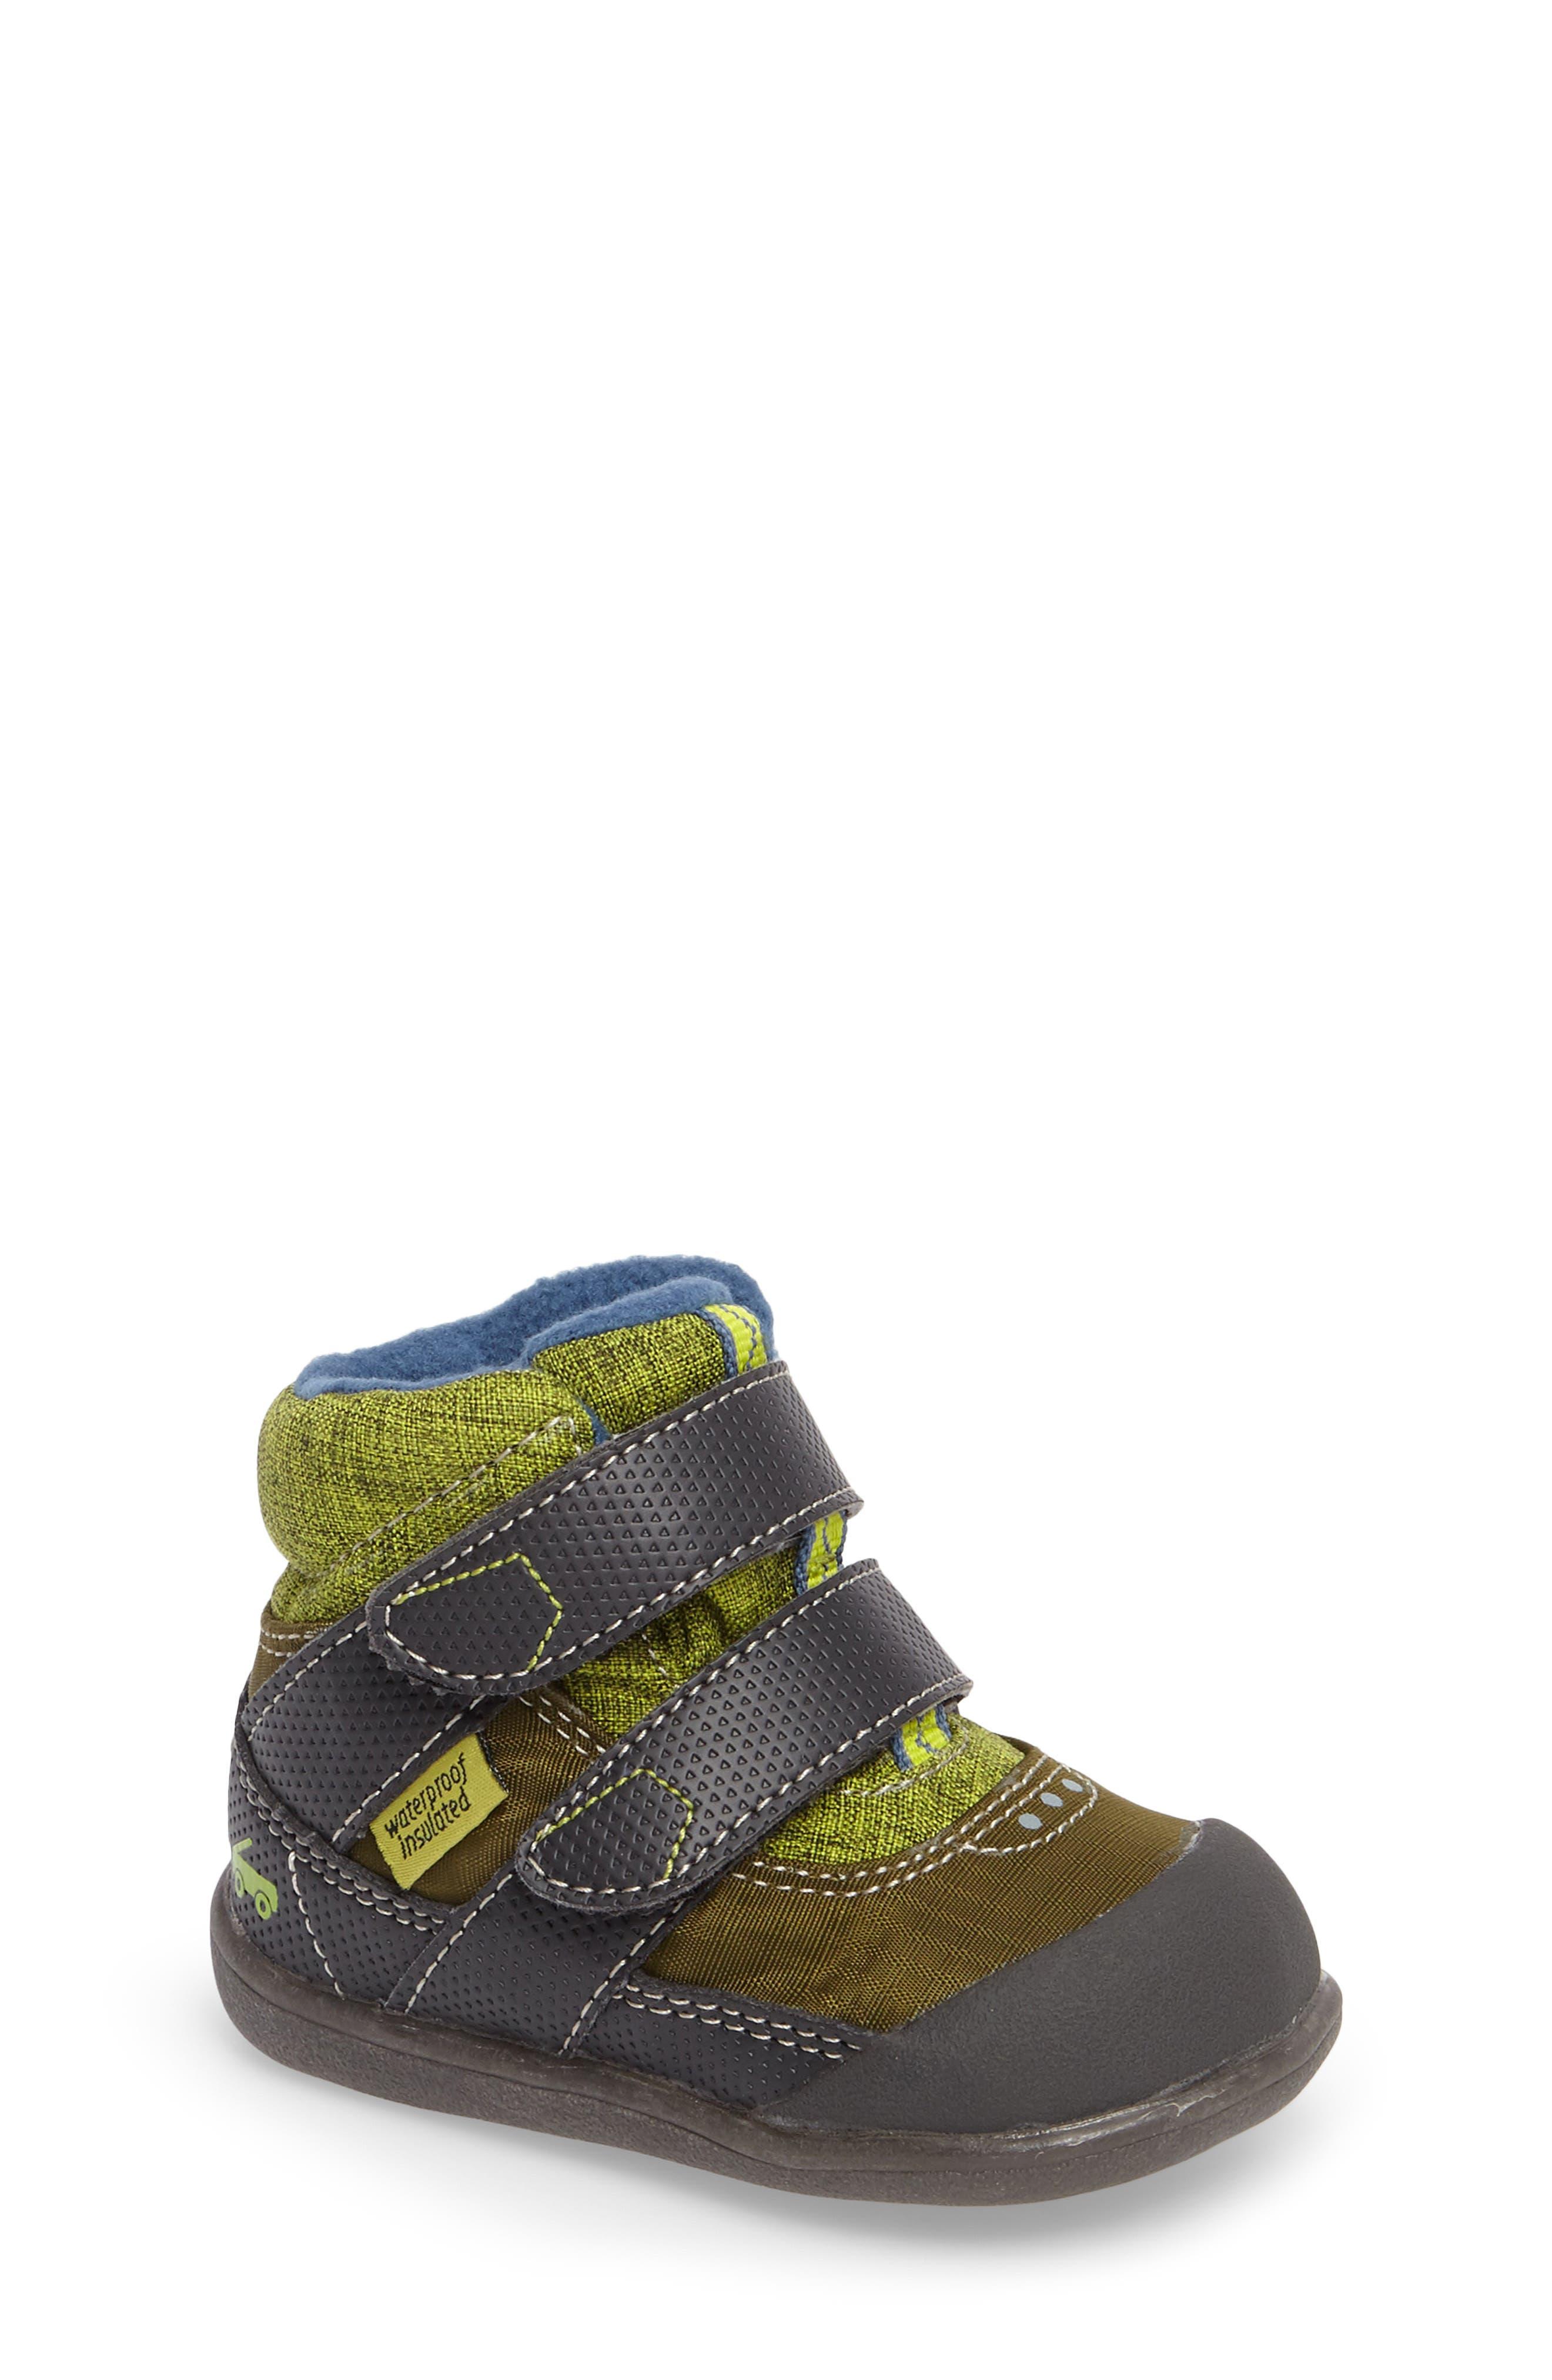 Atlas Waterproof Boot,                         Main,                         color, Green